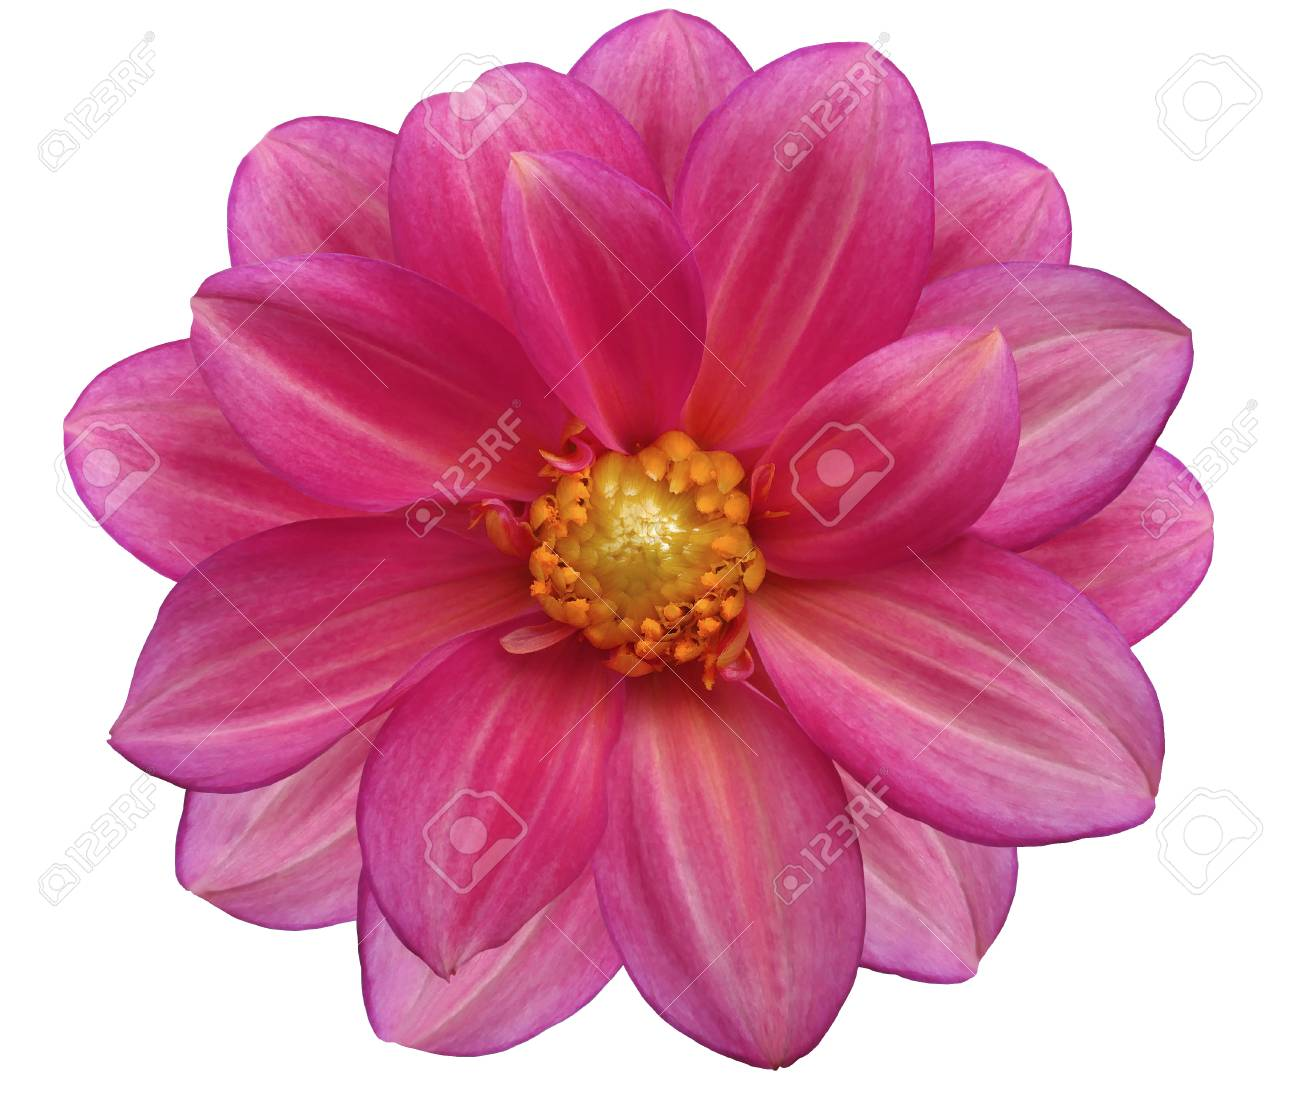 Jardín De Flores Rosa Fondo Blanco Aislado Fotos Retratos